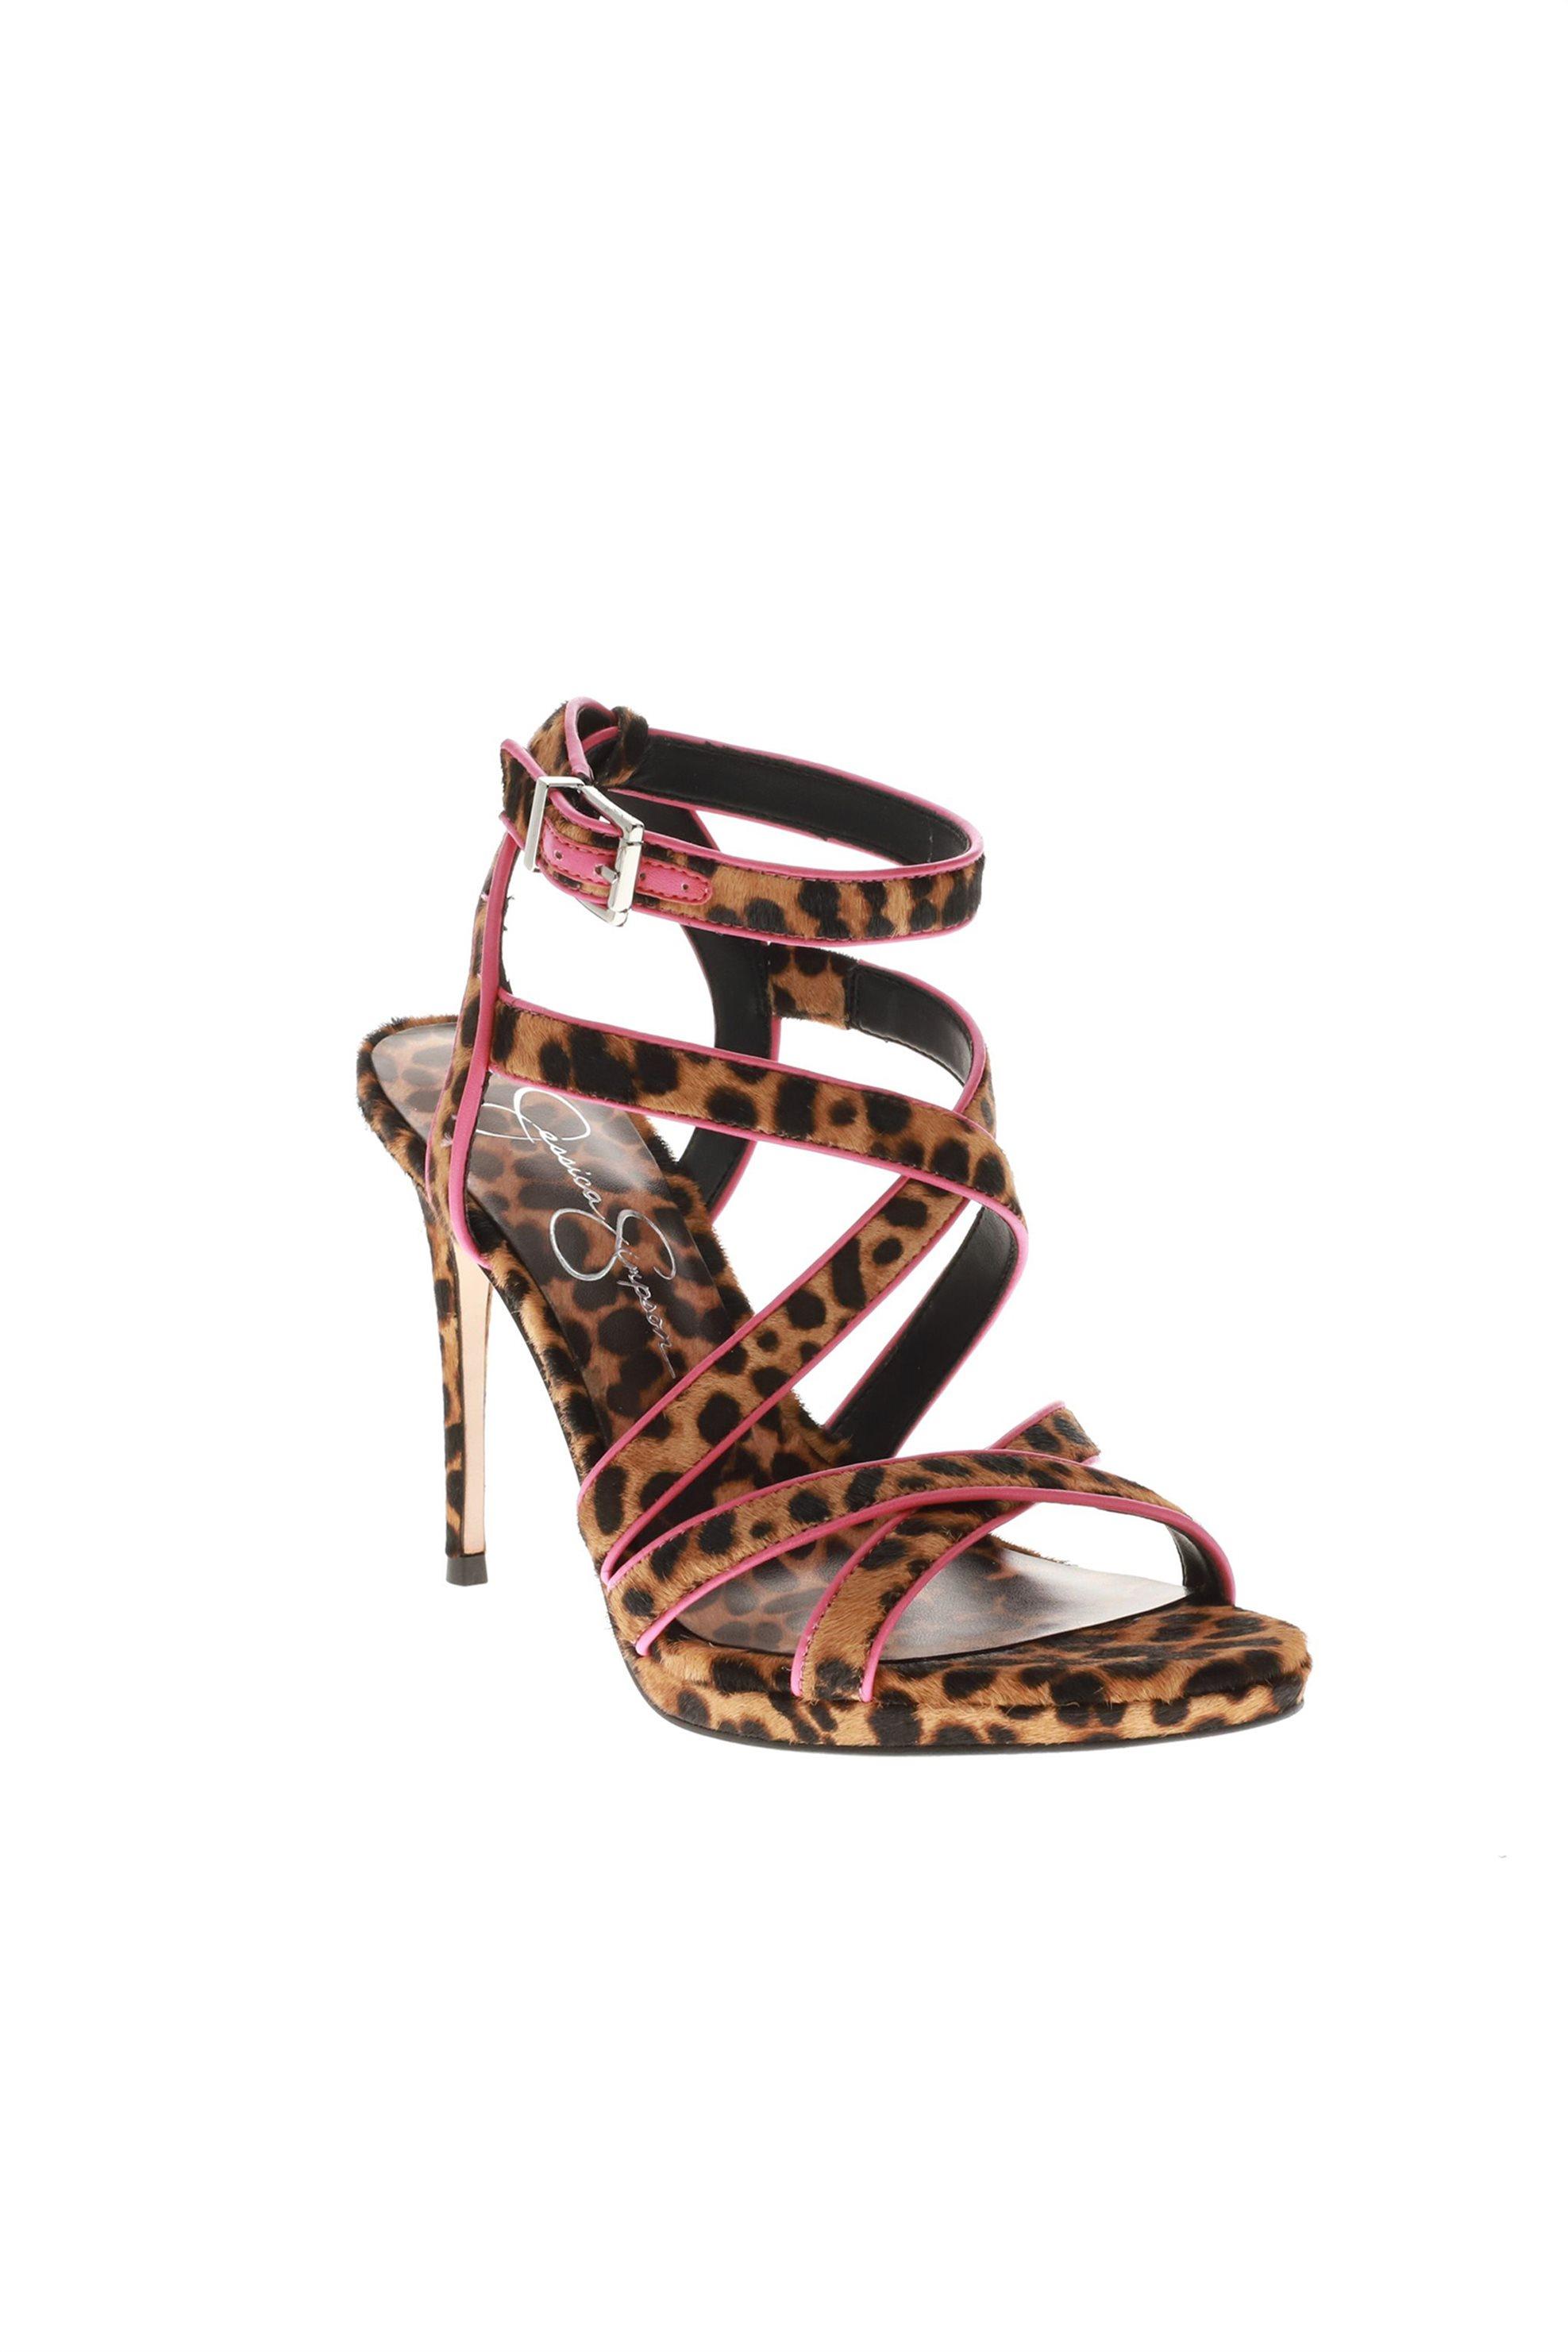 65923f5d2a8 Notos Jessica Simpson γυναικεία ψηλοτάκουνα πέδιλα με animal print –  KENDELE SPLPHC – Μπεζ